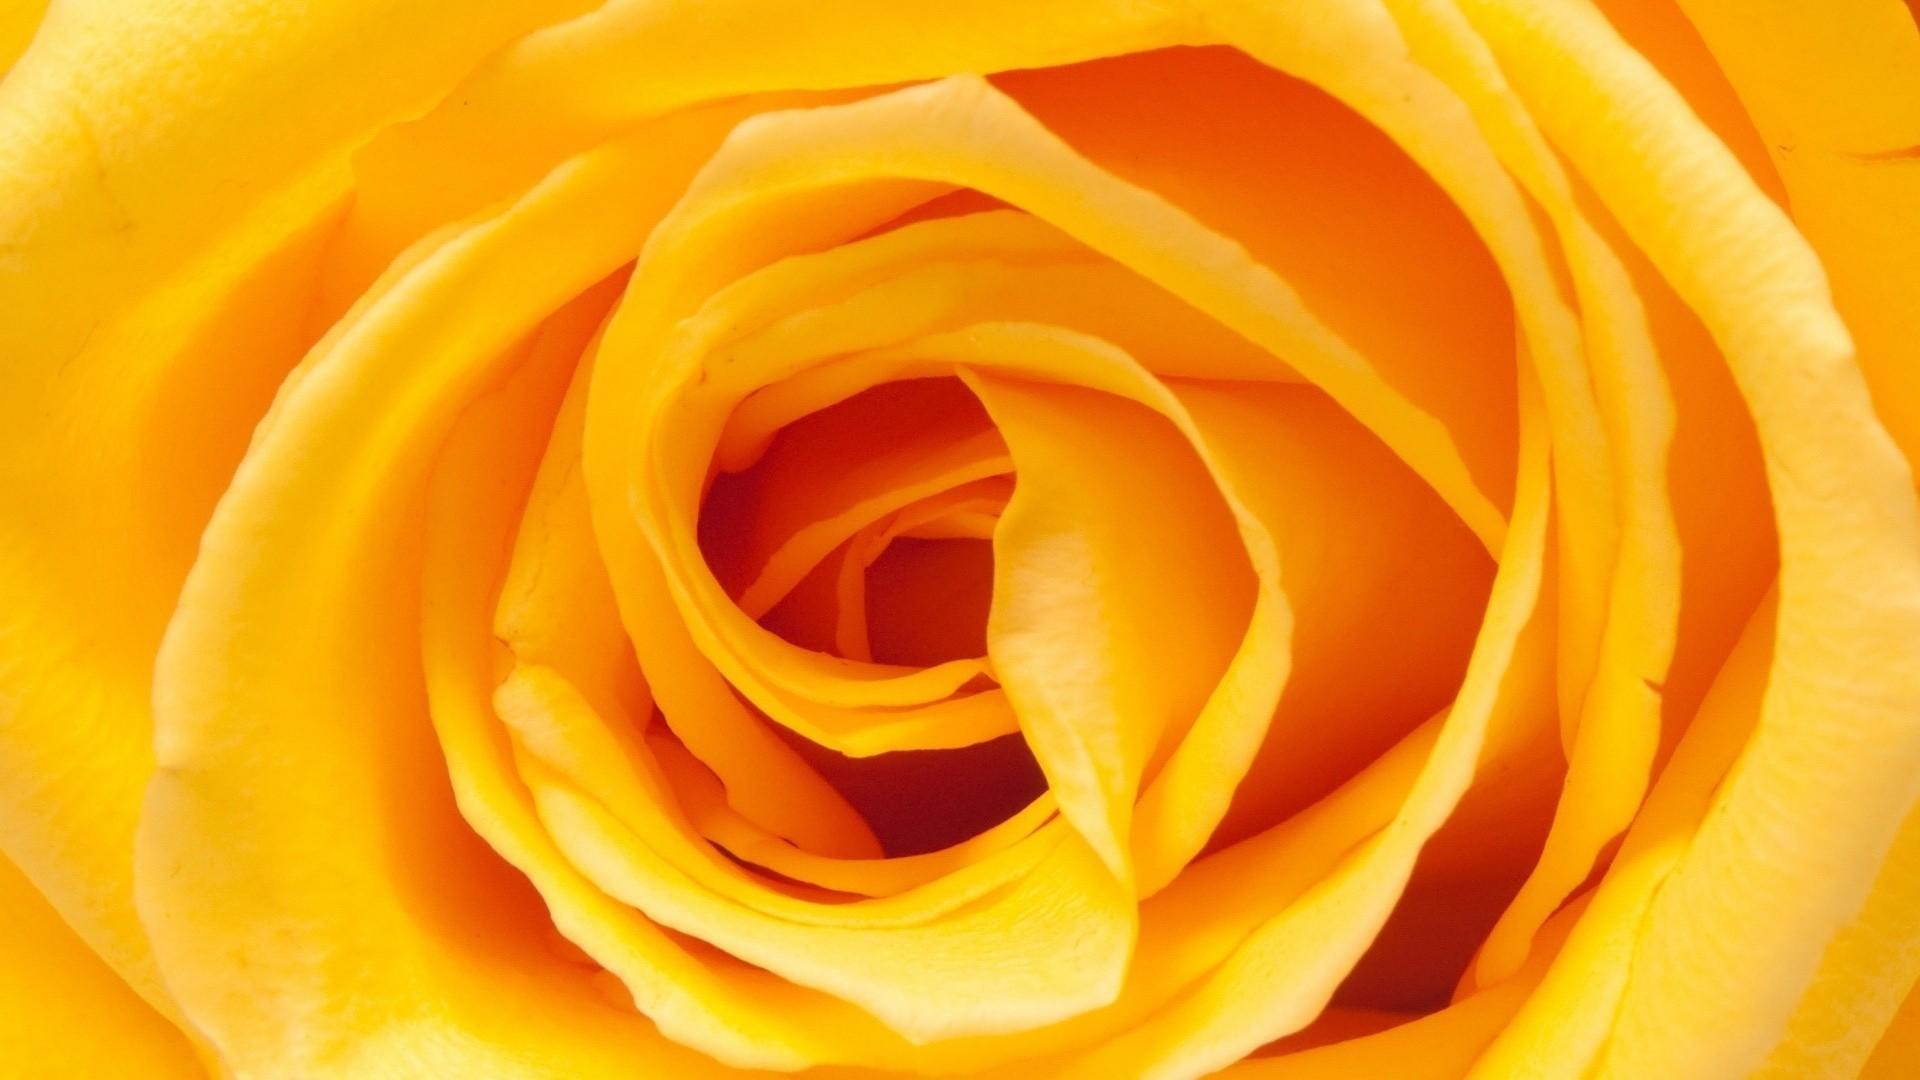 1920x1080 1920x1259 Beautiful Yellow Rose Flower Wallpaper For Desktop